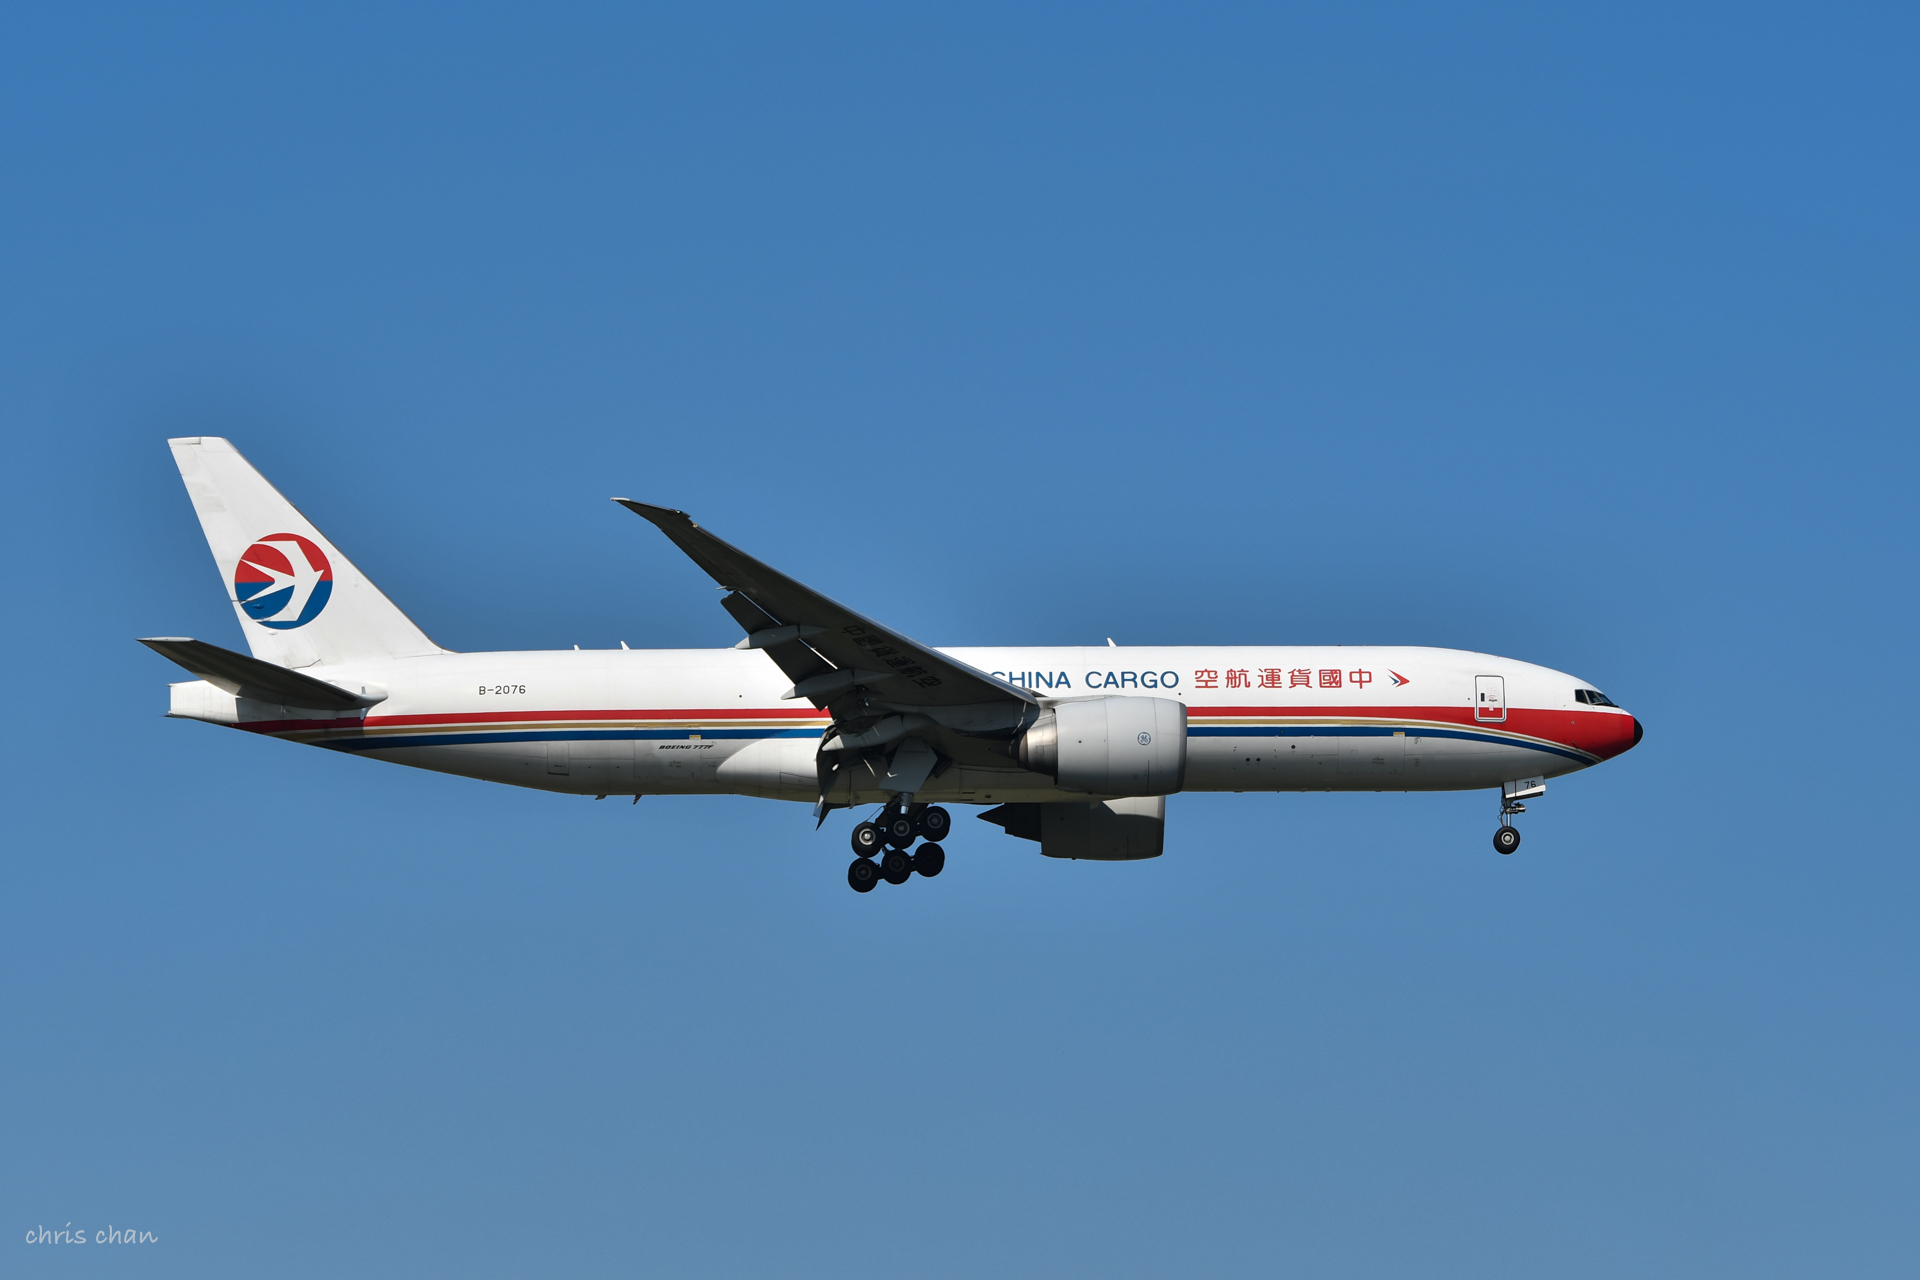 Re:[原创]新人报道——PVG首拍 BOEING 777-200 B-2076 中国上海浦东国际机场